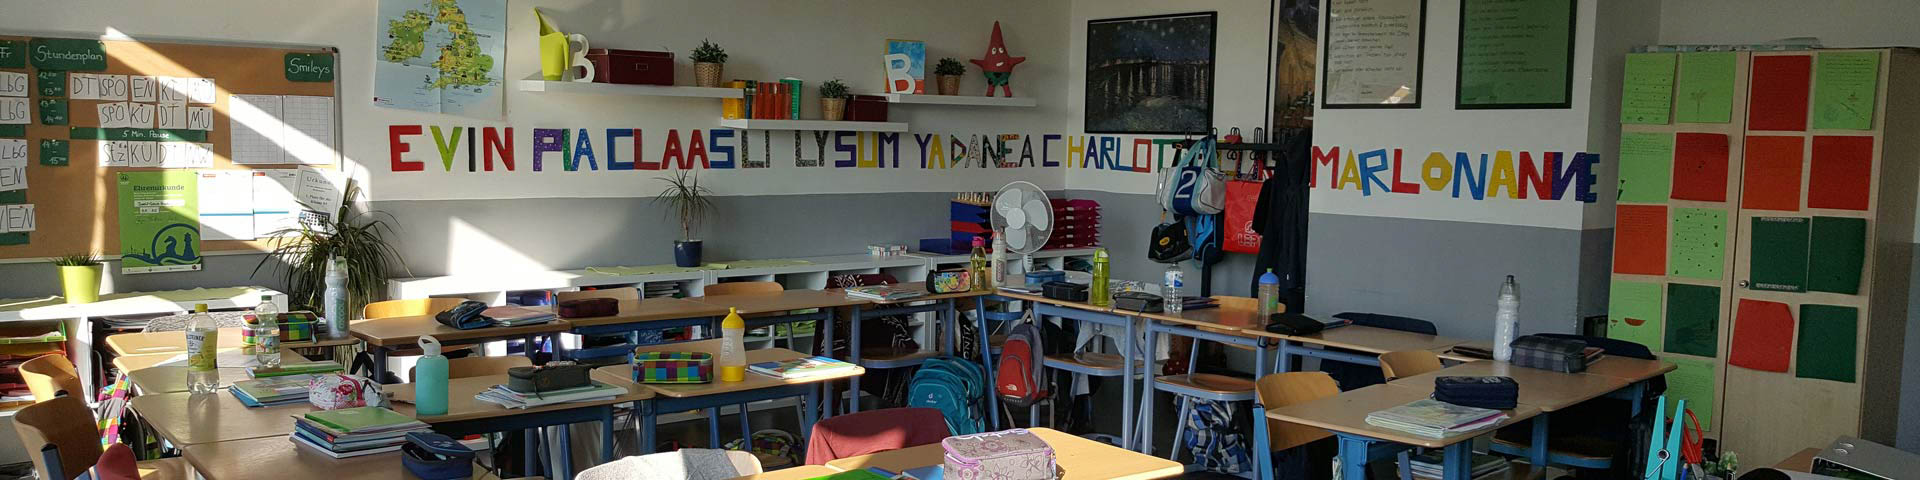 Klassenraum Neubau Stadtteilschule